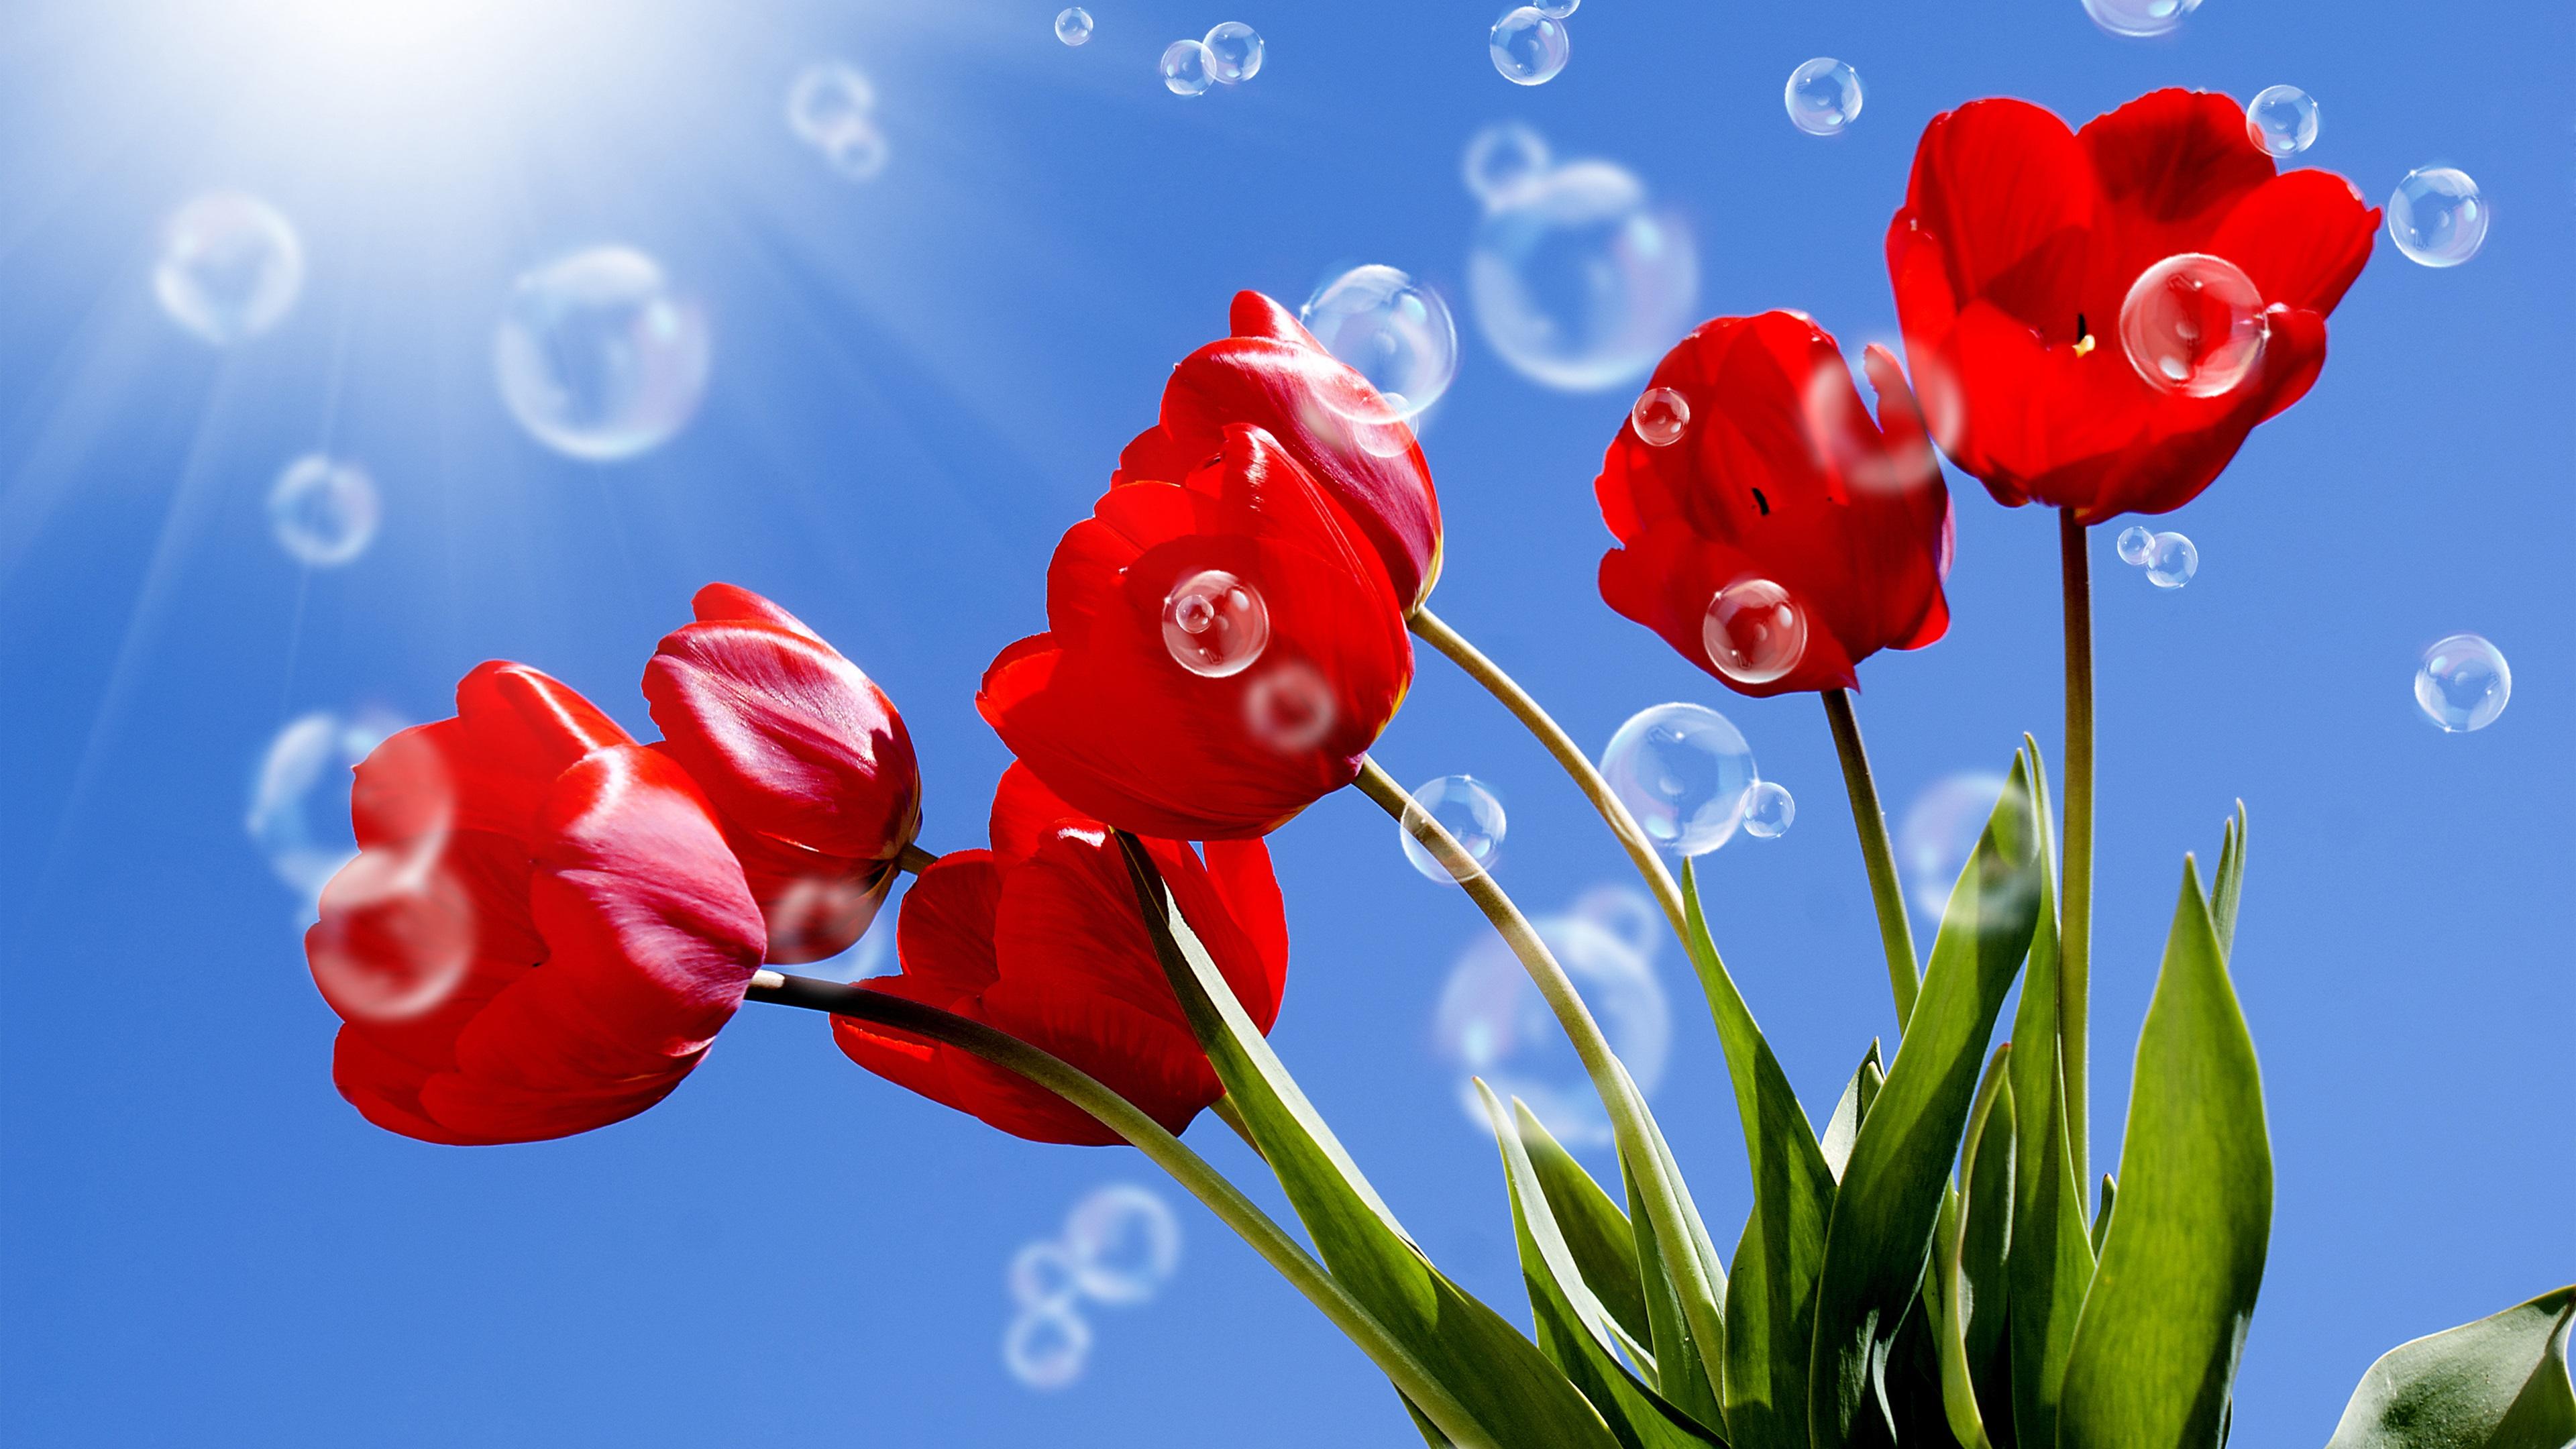 Fondos De Pantalla Tulipanes Rojos, Tallos, Burbujas